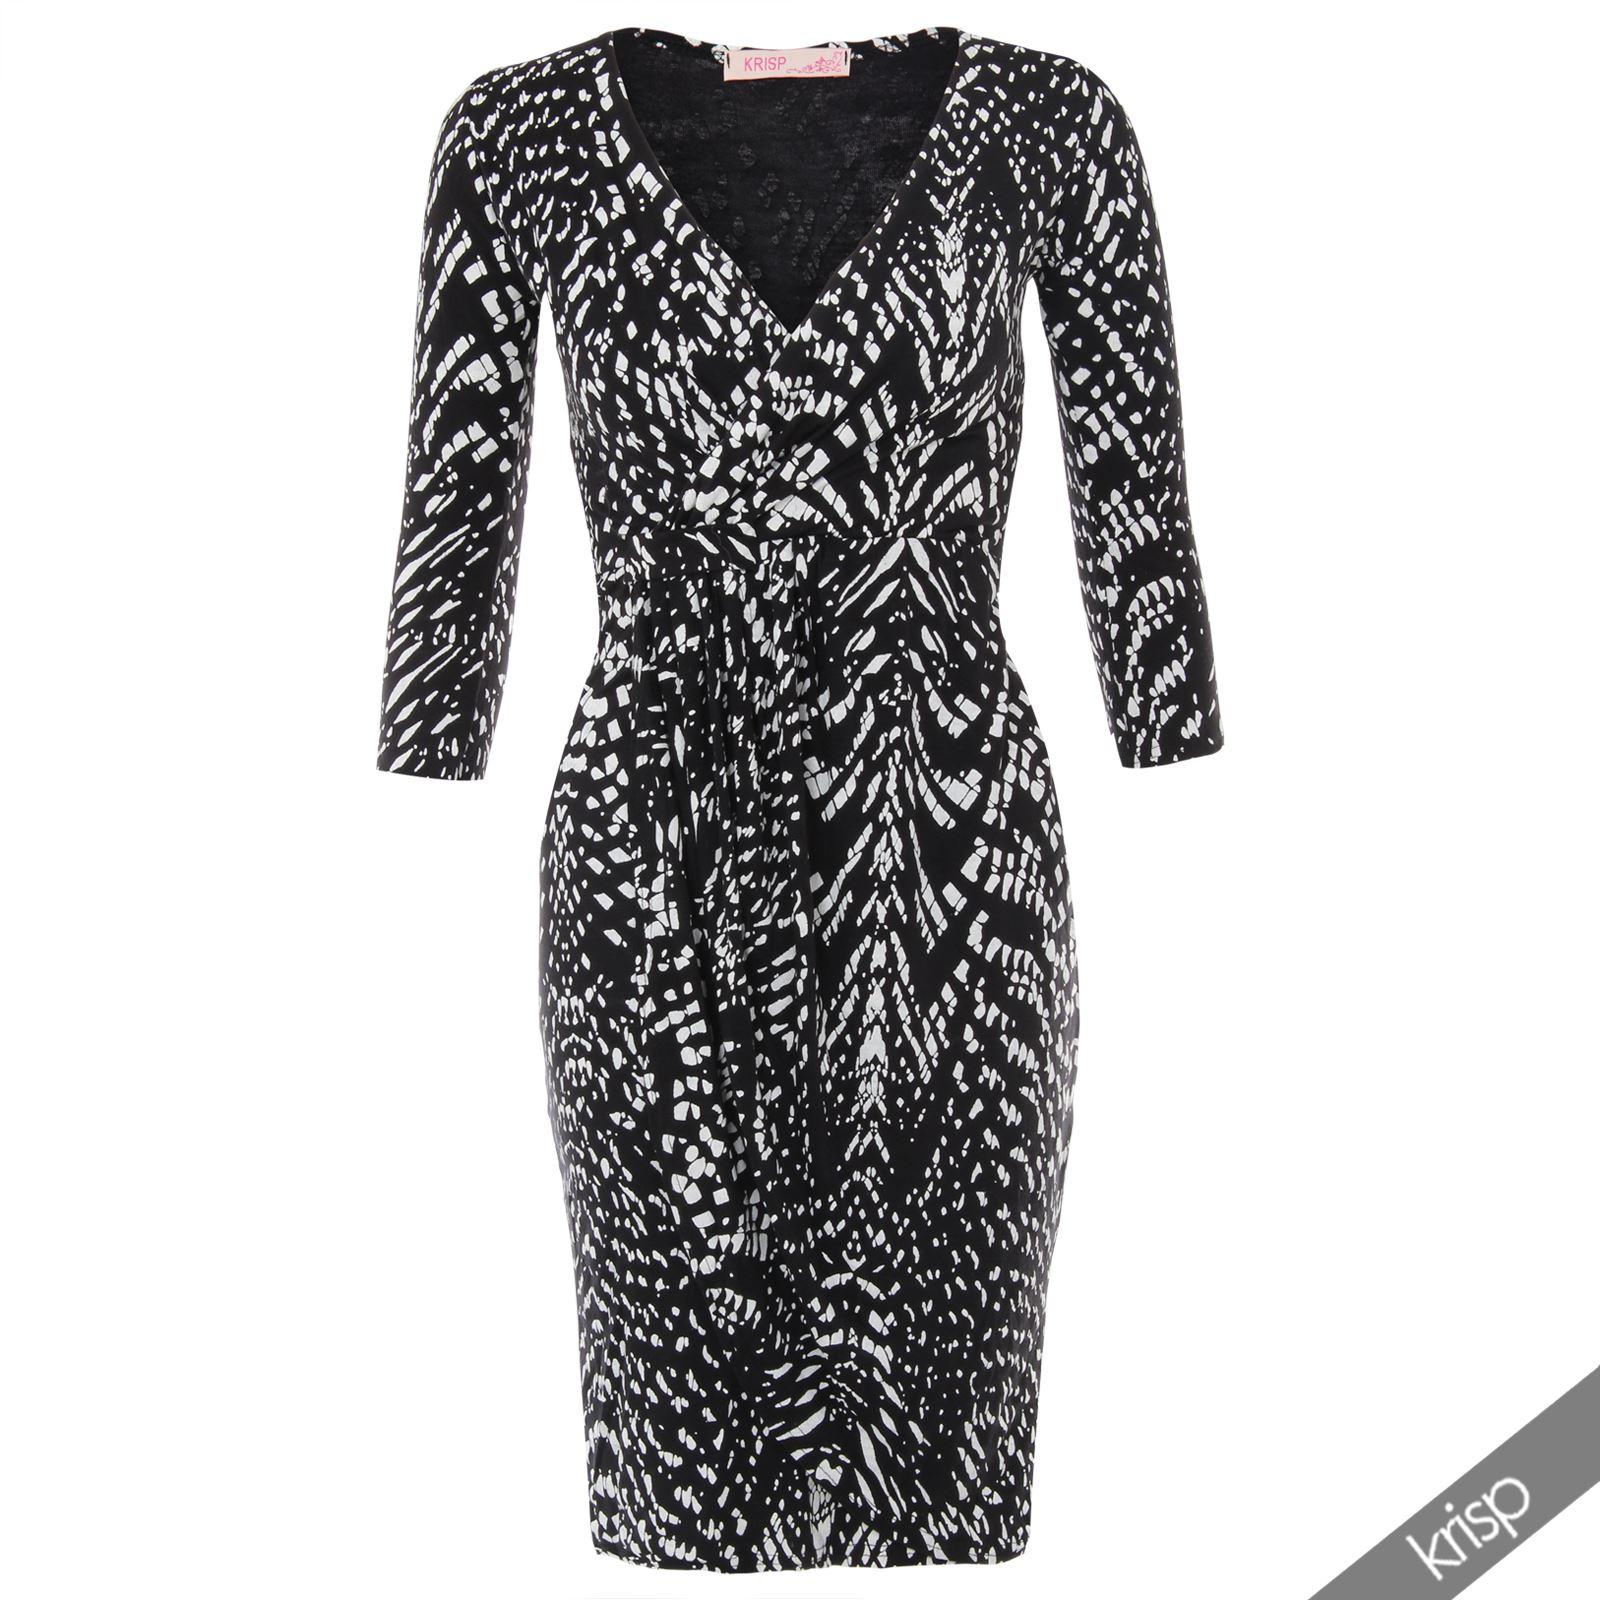 Womens-V-Neck-Dress-Top-Bodycon-Skirt-Midi-Snakeskin-Print-Cross-Over-Party-Wrap thumbnail 6